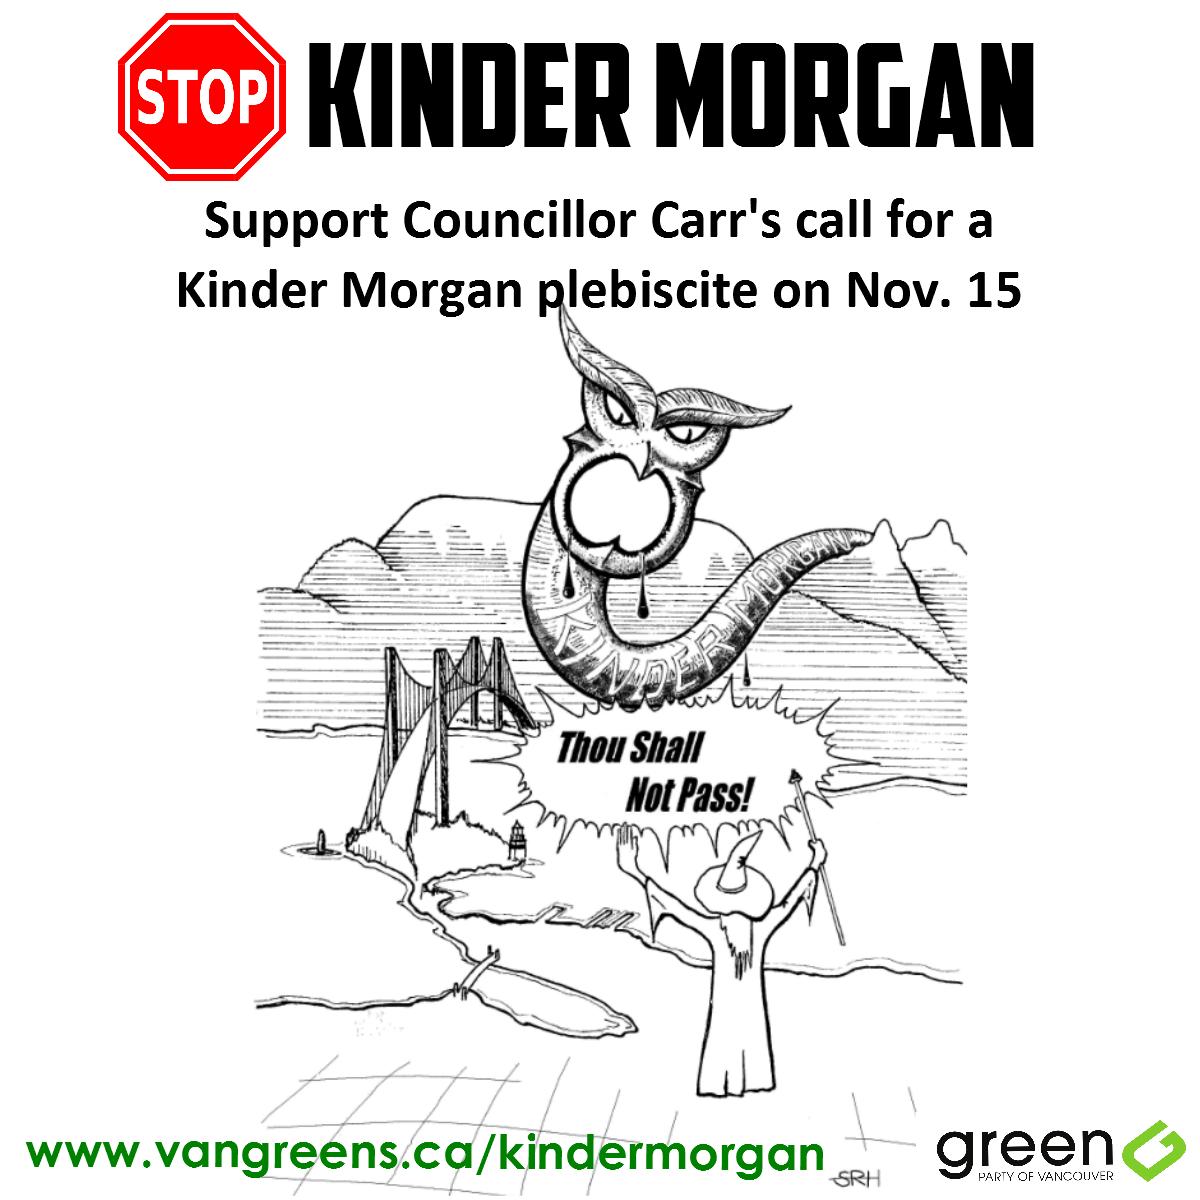 Stop_kinder_morgan_FB_image.png